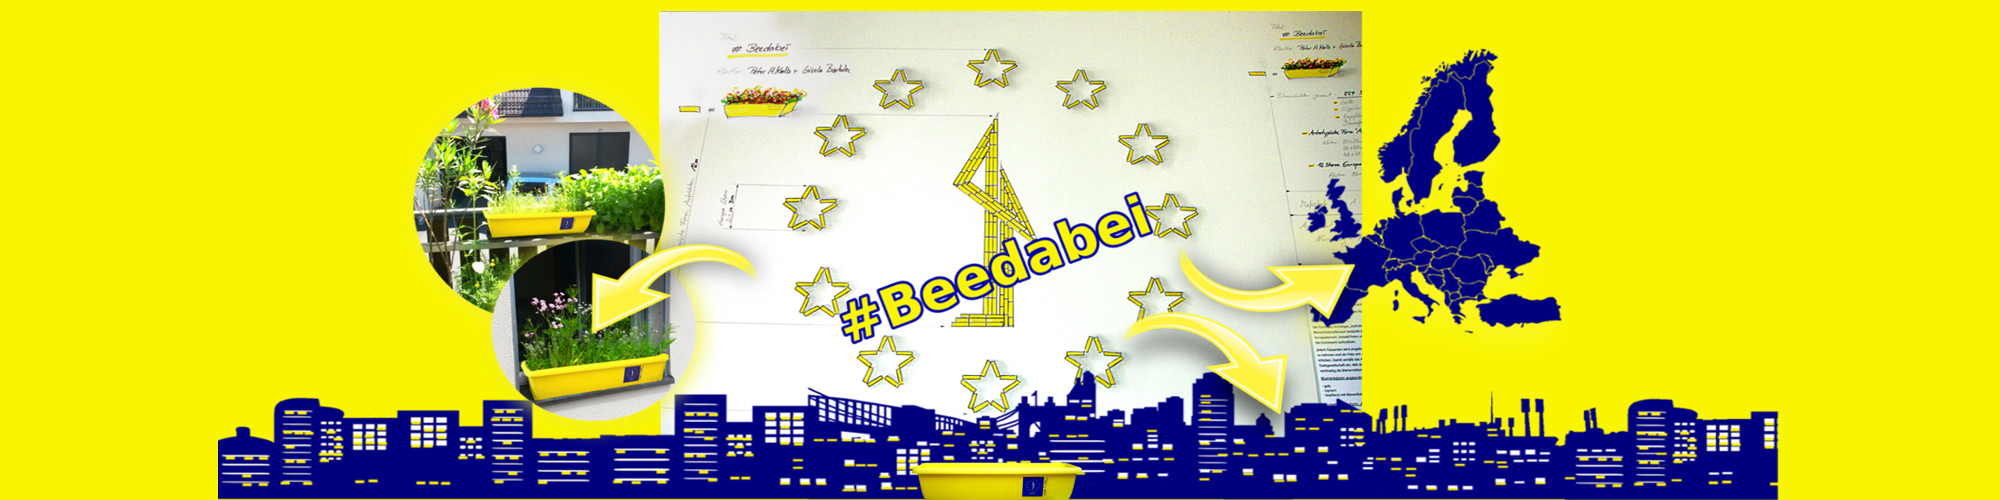 Beedabei-Plan-Projekt